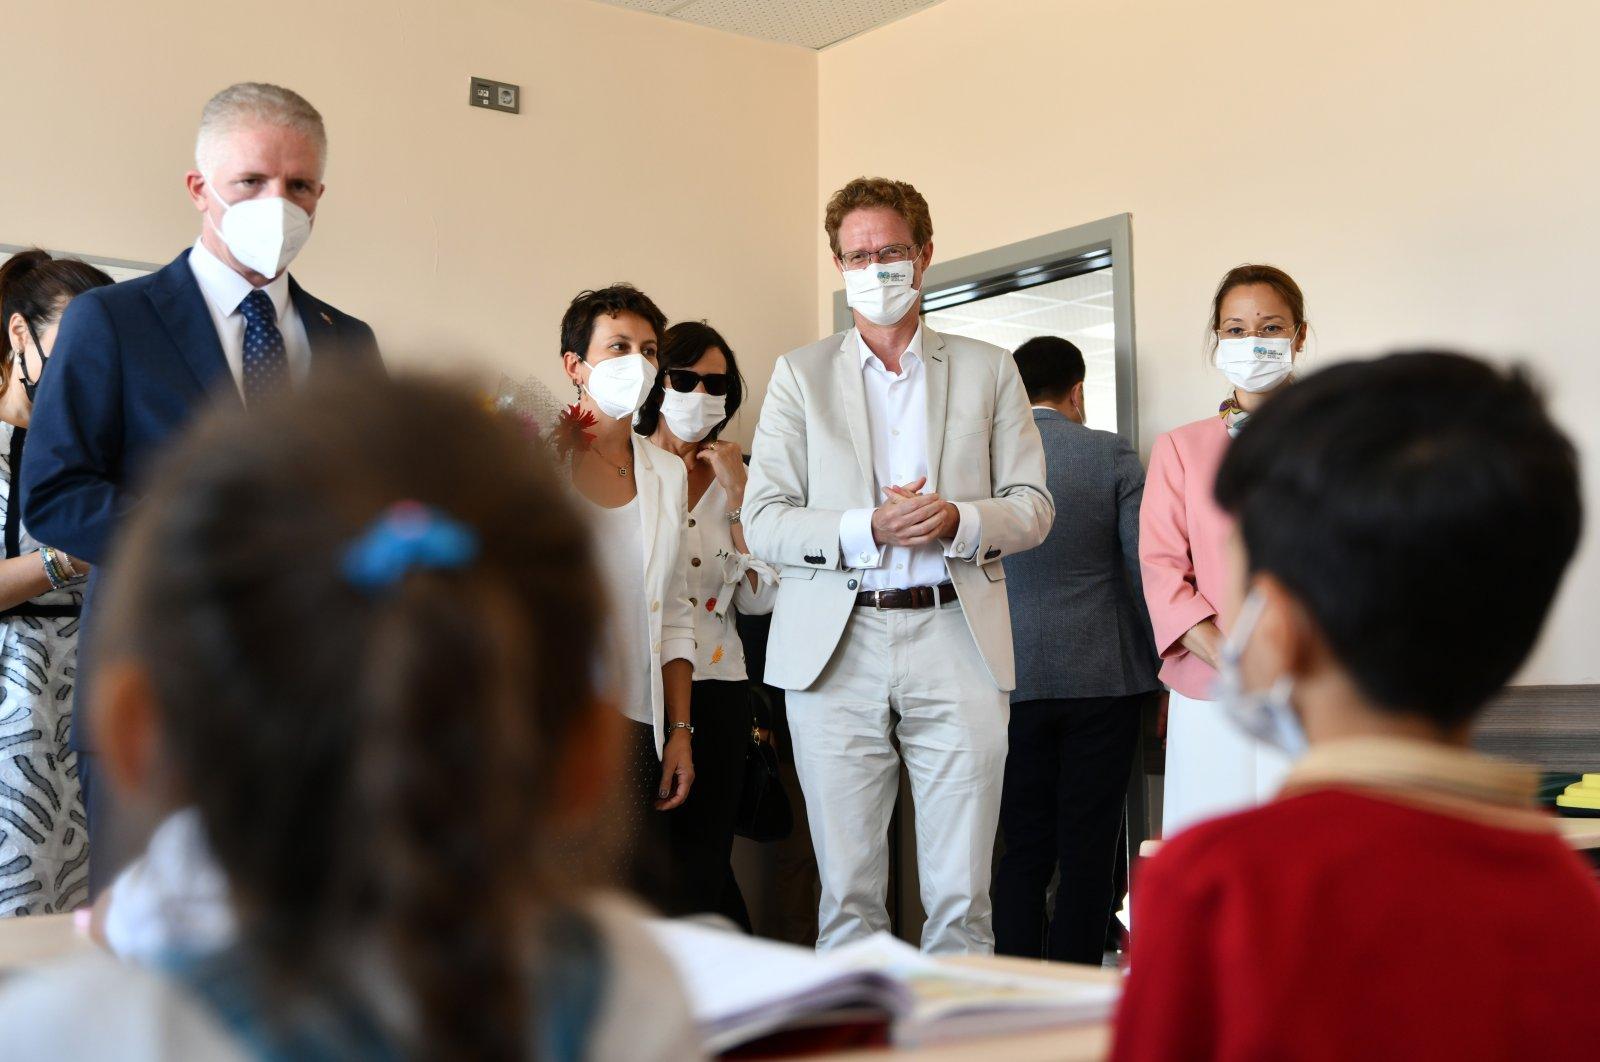 Head of the EU delegation to Turkey Nikolaus Meyer-Landrut visits the Abdulkadir Ateş Primary school in the Şahinbey district, Gaziantep, Turkey, Sept. 21, 2021 (AA Photo)